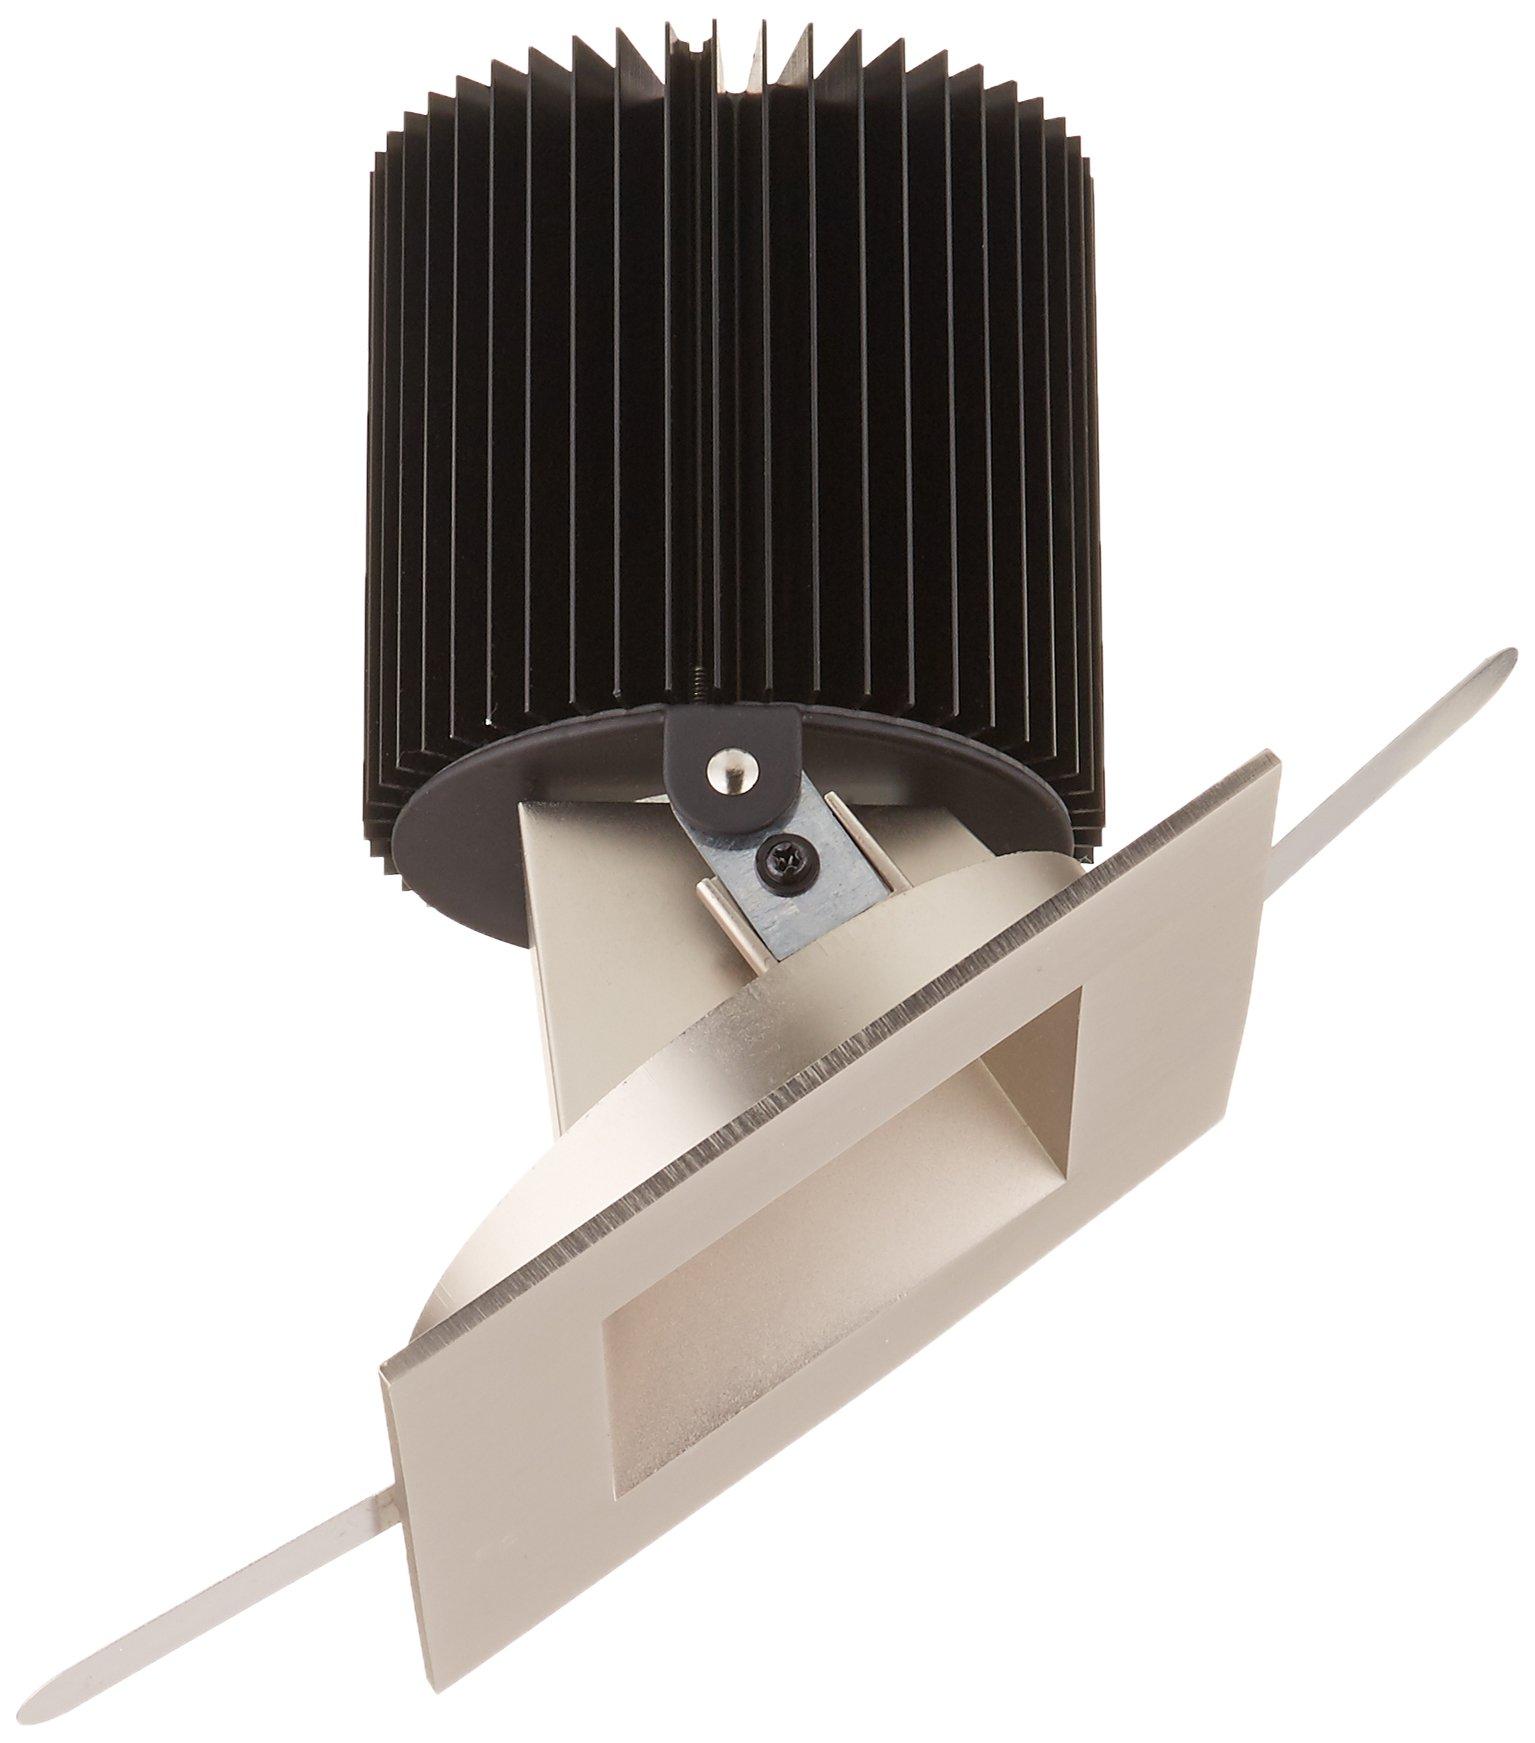 WAC Lighting HR-2LED-T709S-W-BN Tesla 3000K 15-Degree Beam Angle LED 2-Inch Open Square Trim